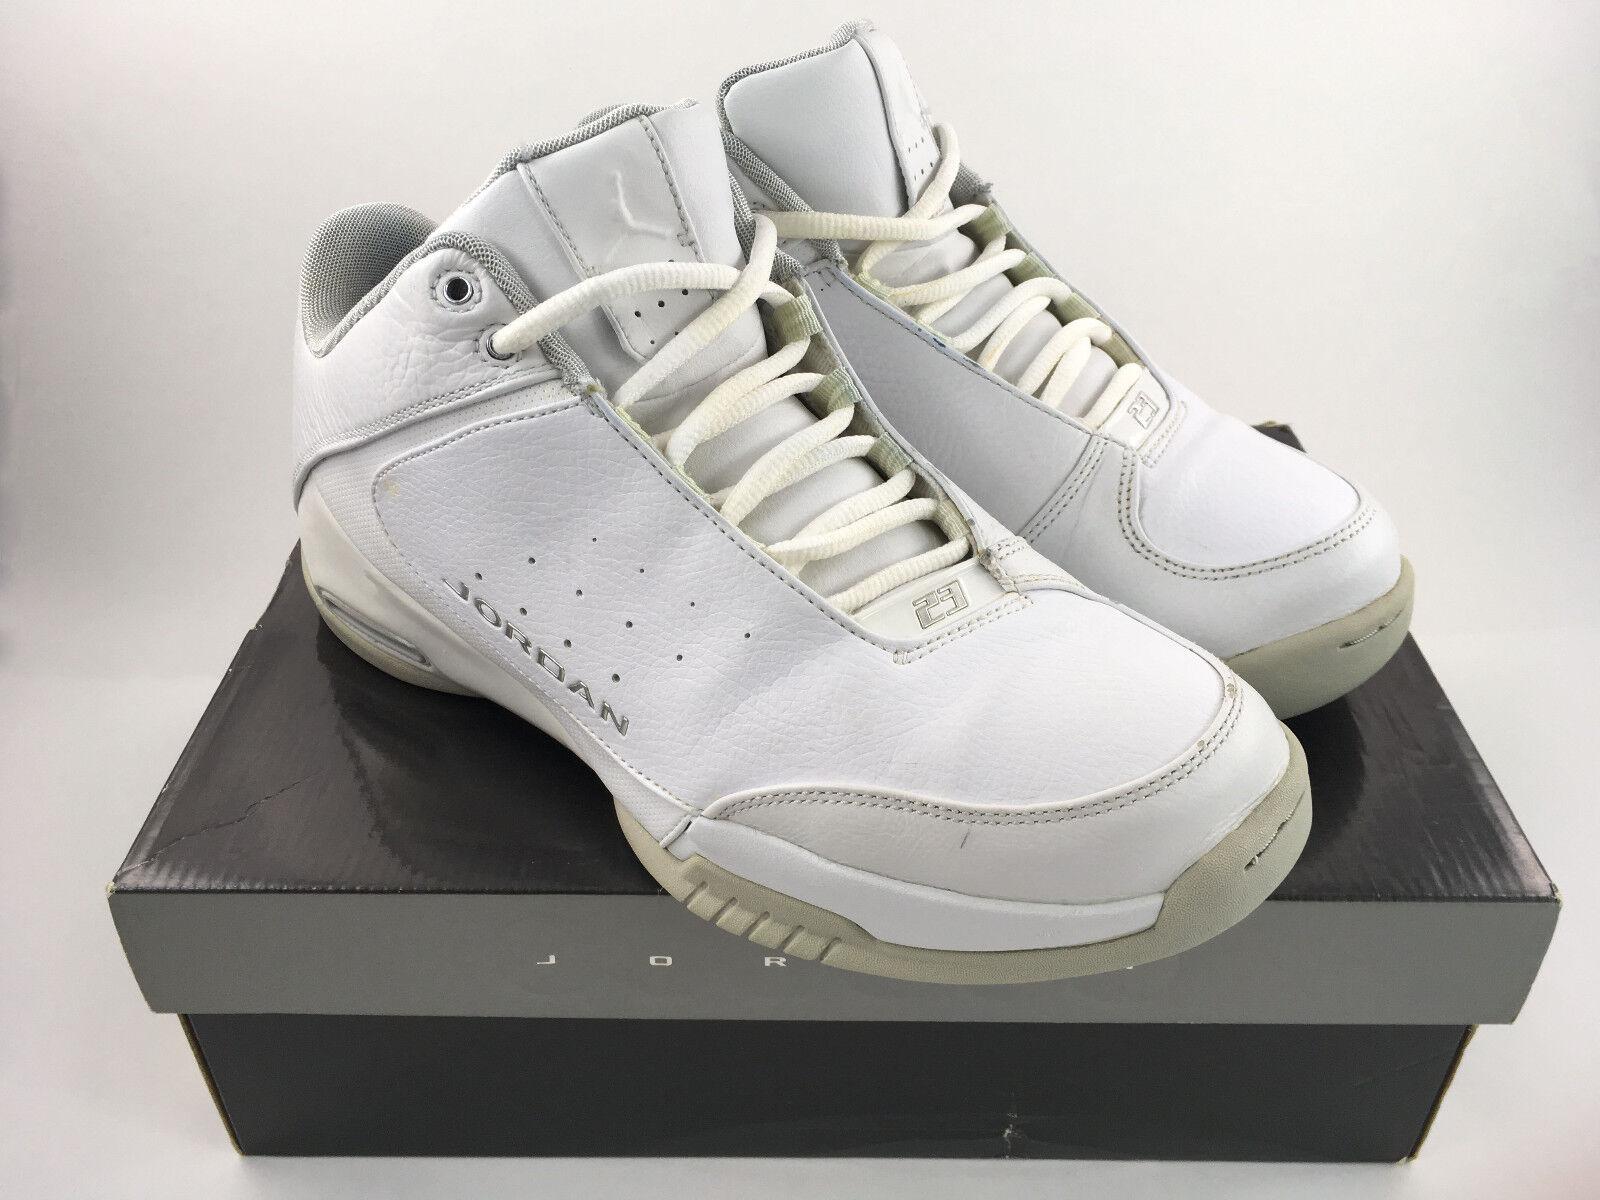 Jordan Team Strong Low Shoes 2006 -White/Metallic Silver Sz 9.5 - 313534107-RARE